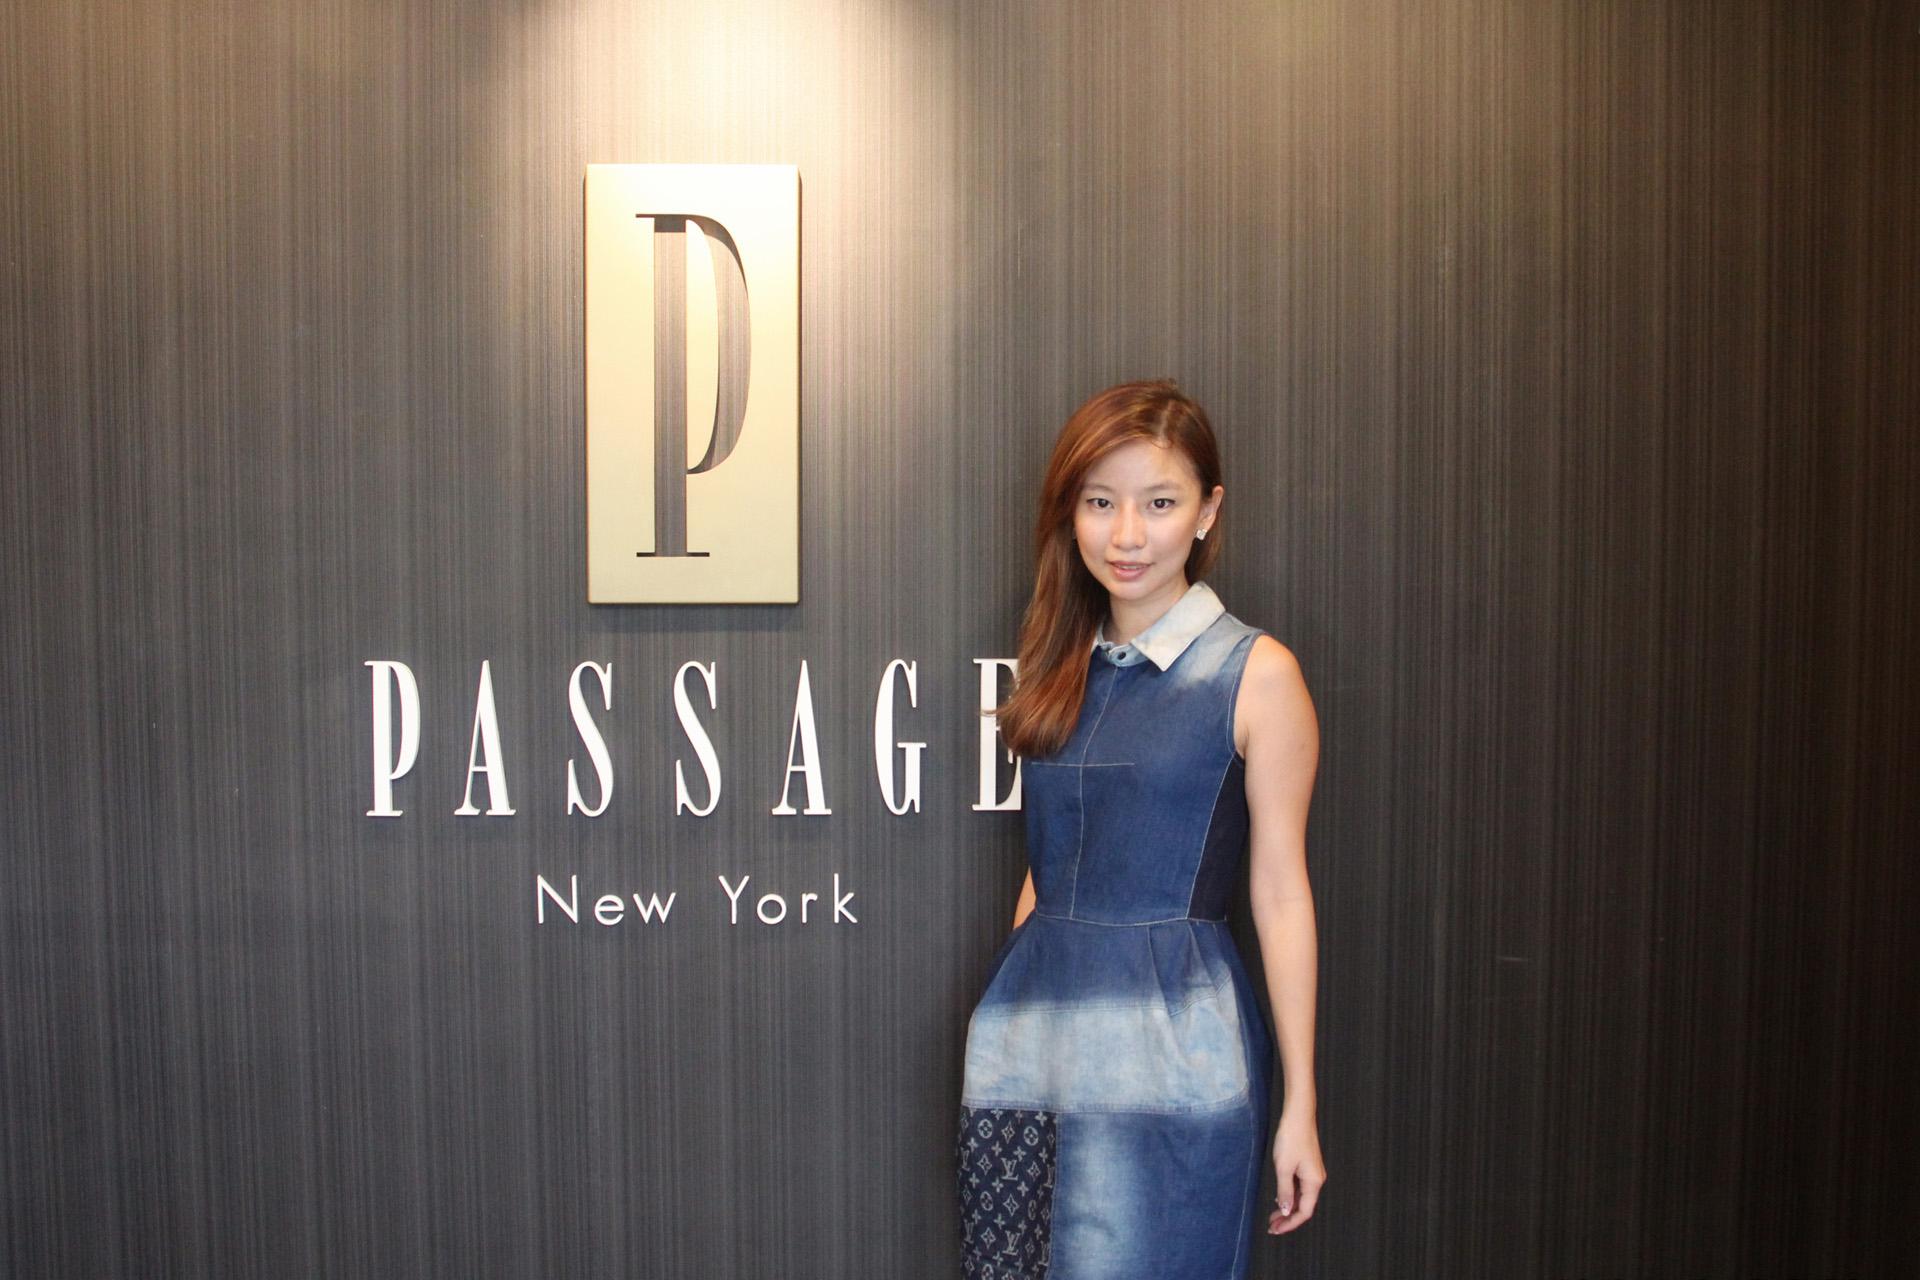 Passage New York